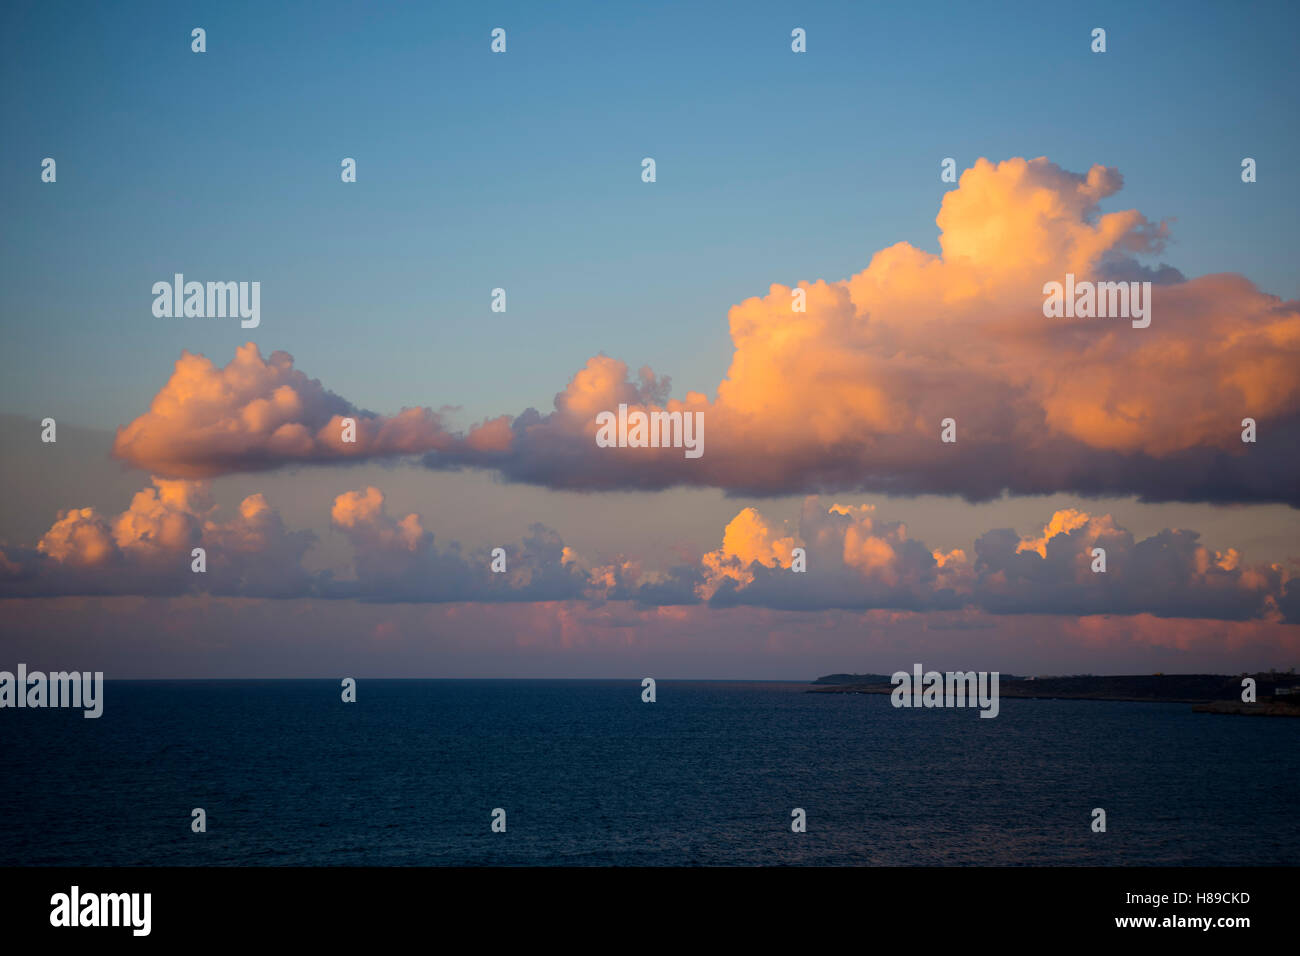 Greece, Crete, Chania, evening clouds - Stock Image